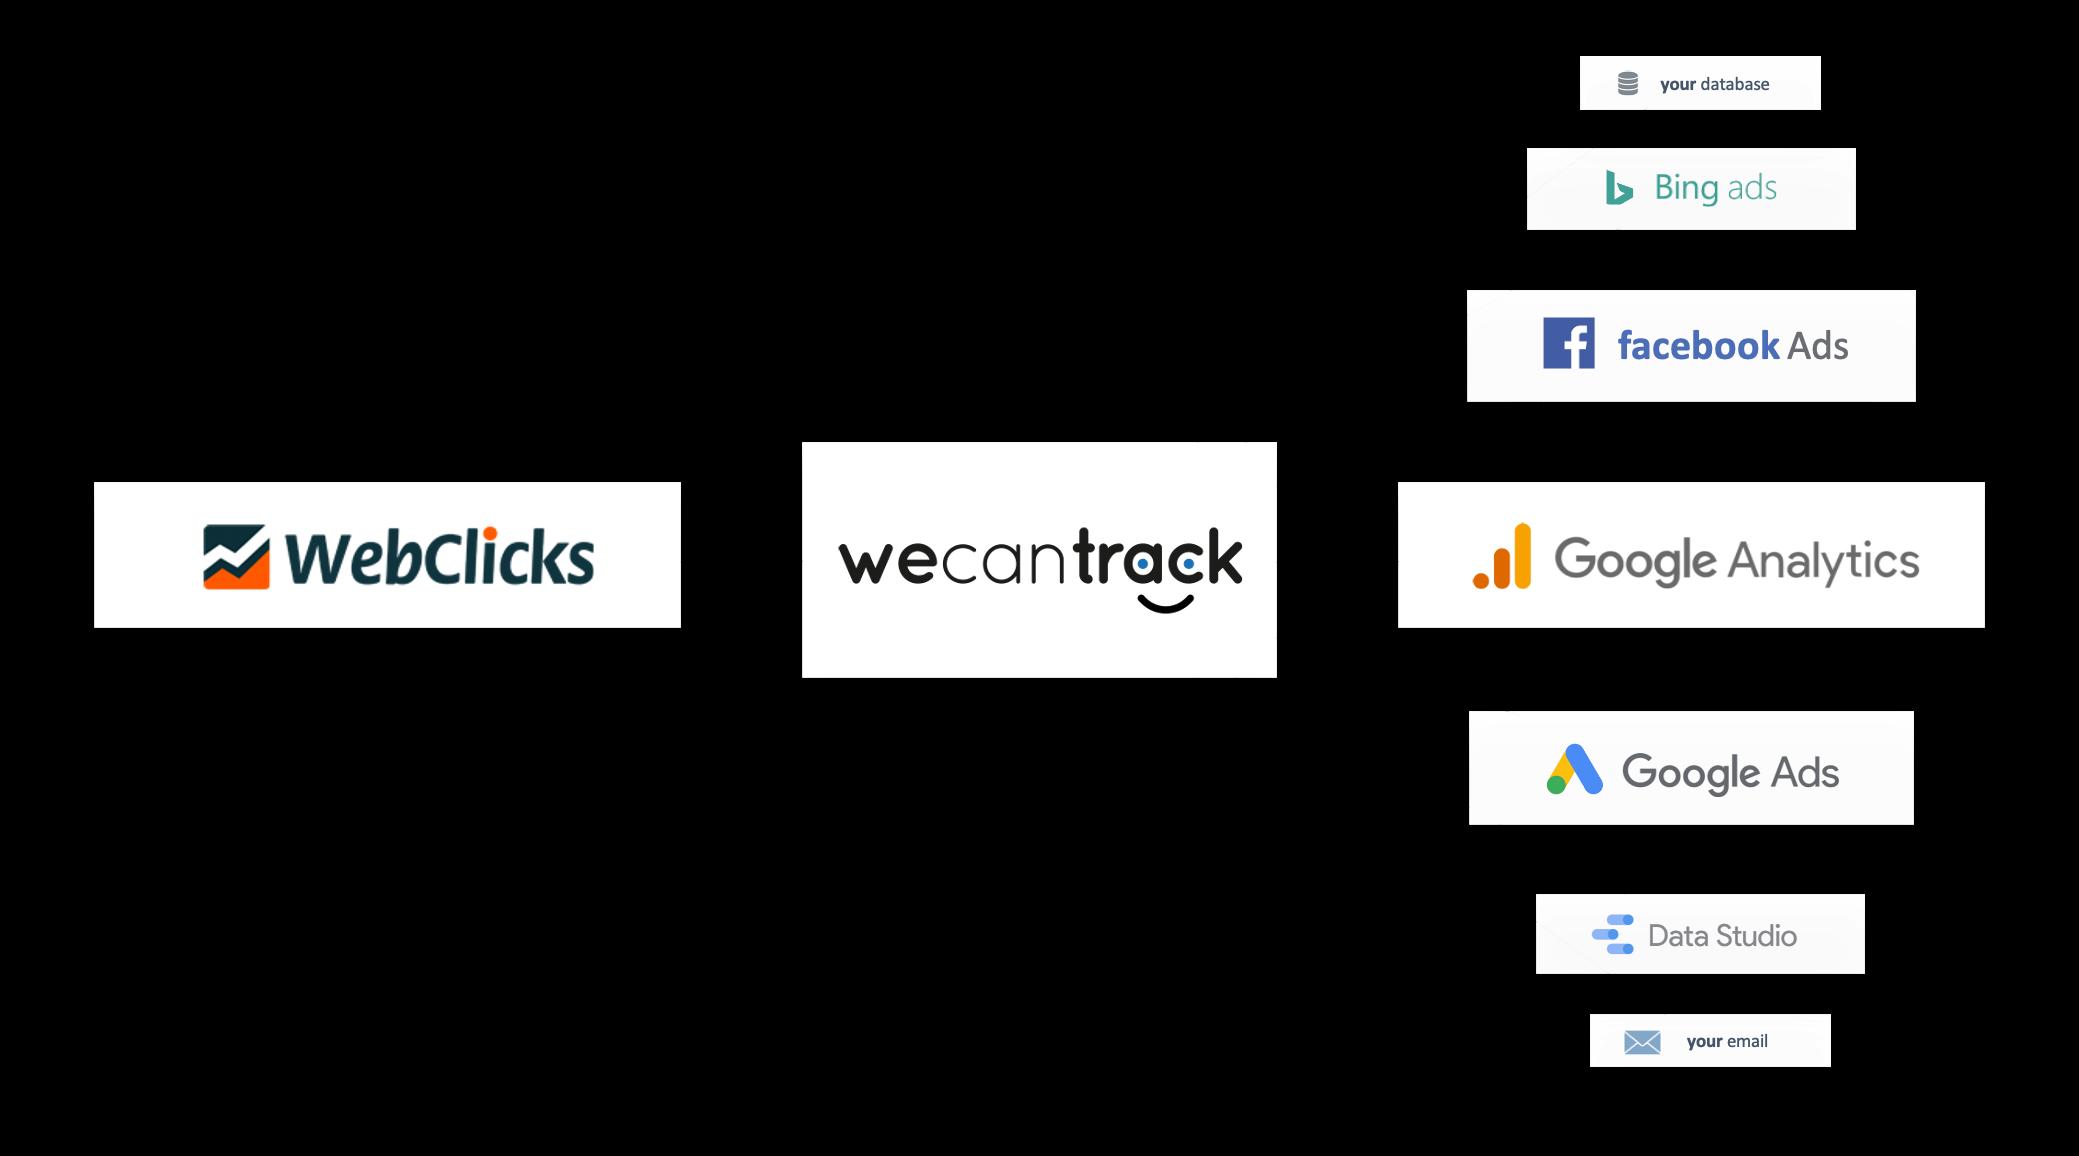 integrate-webclicks-affiliate-conversions-via-postback